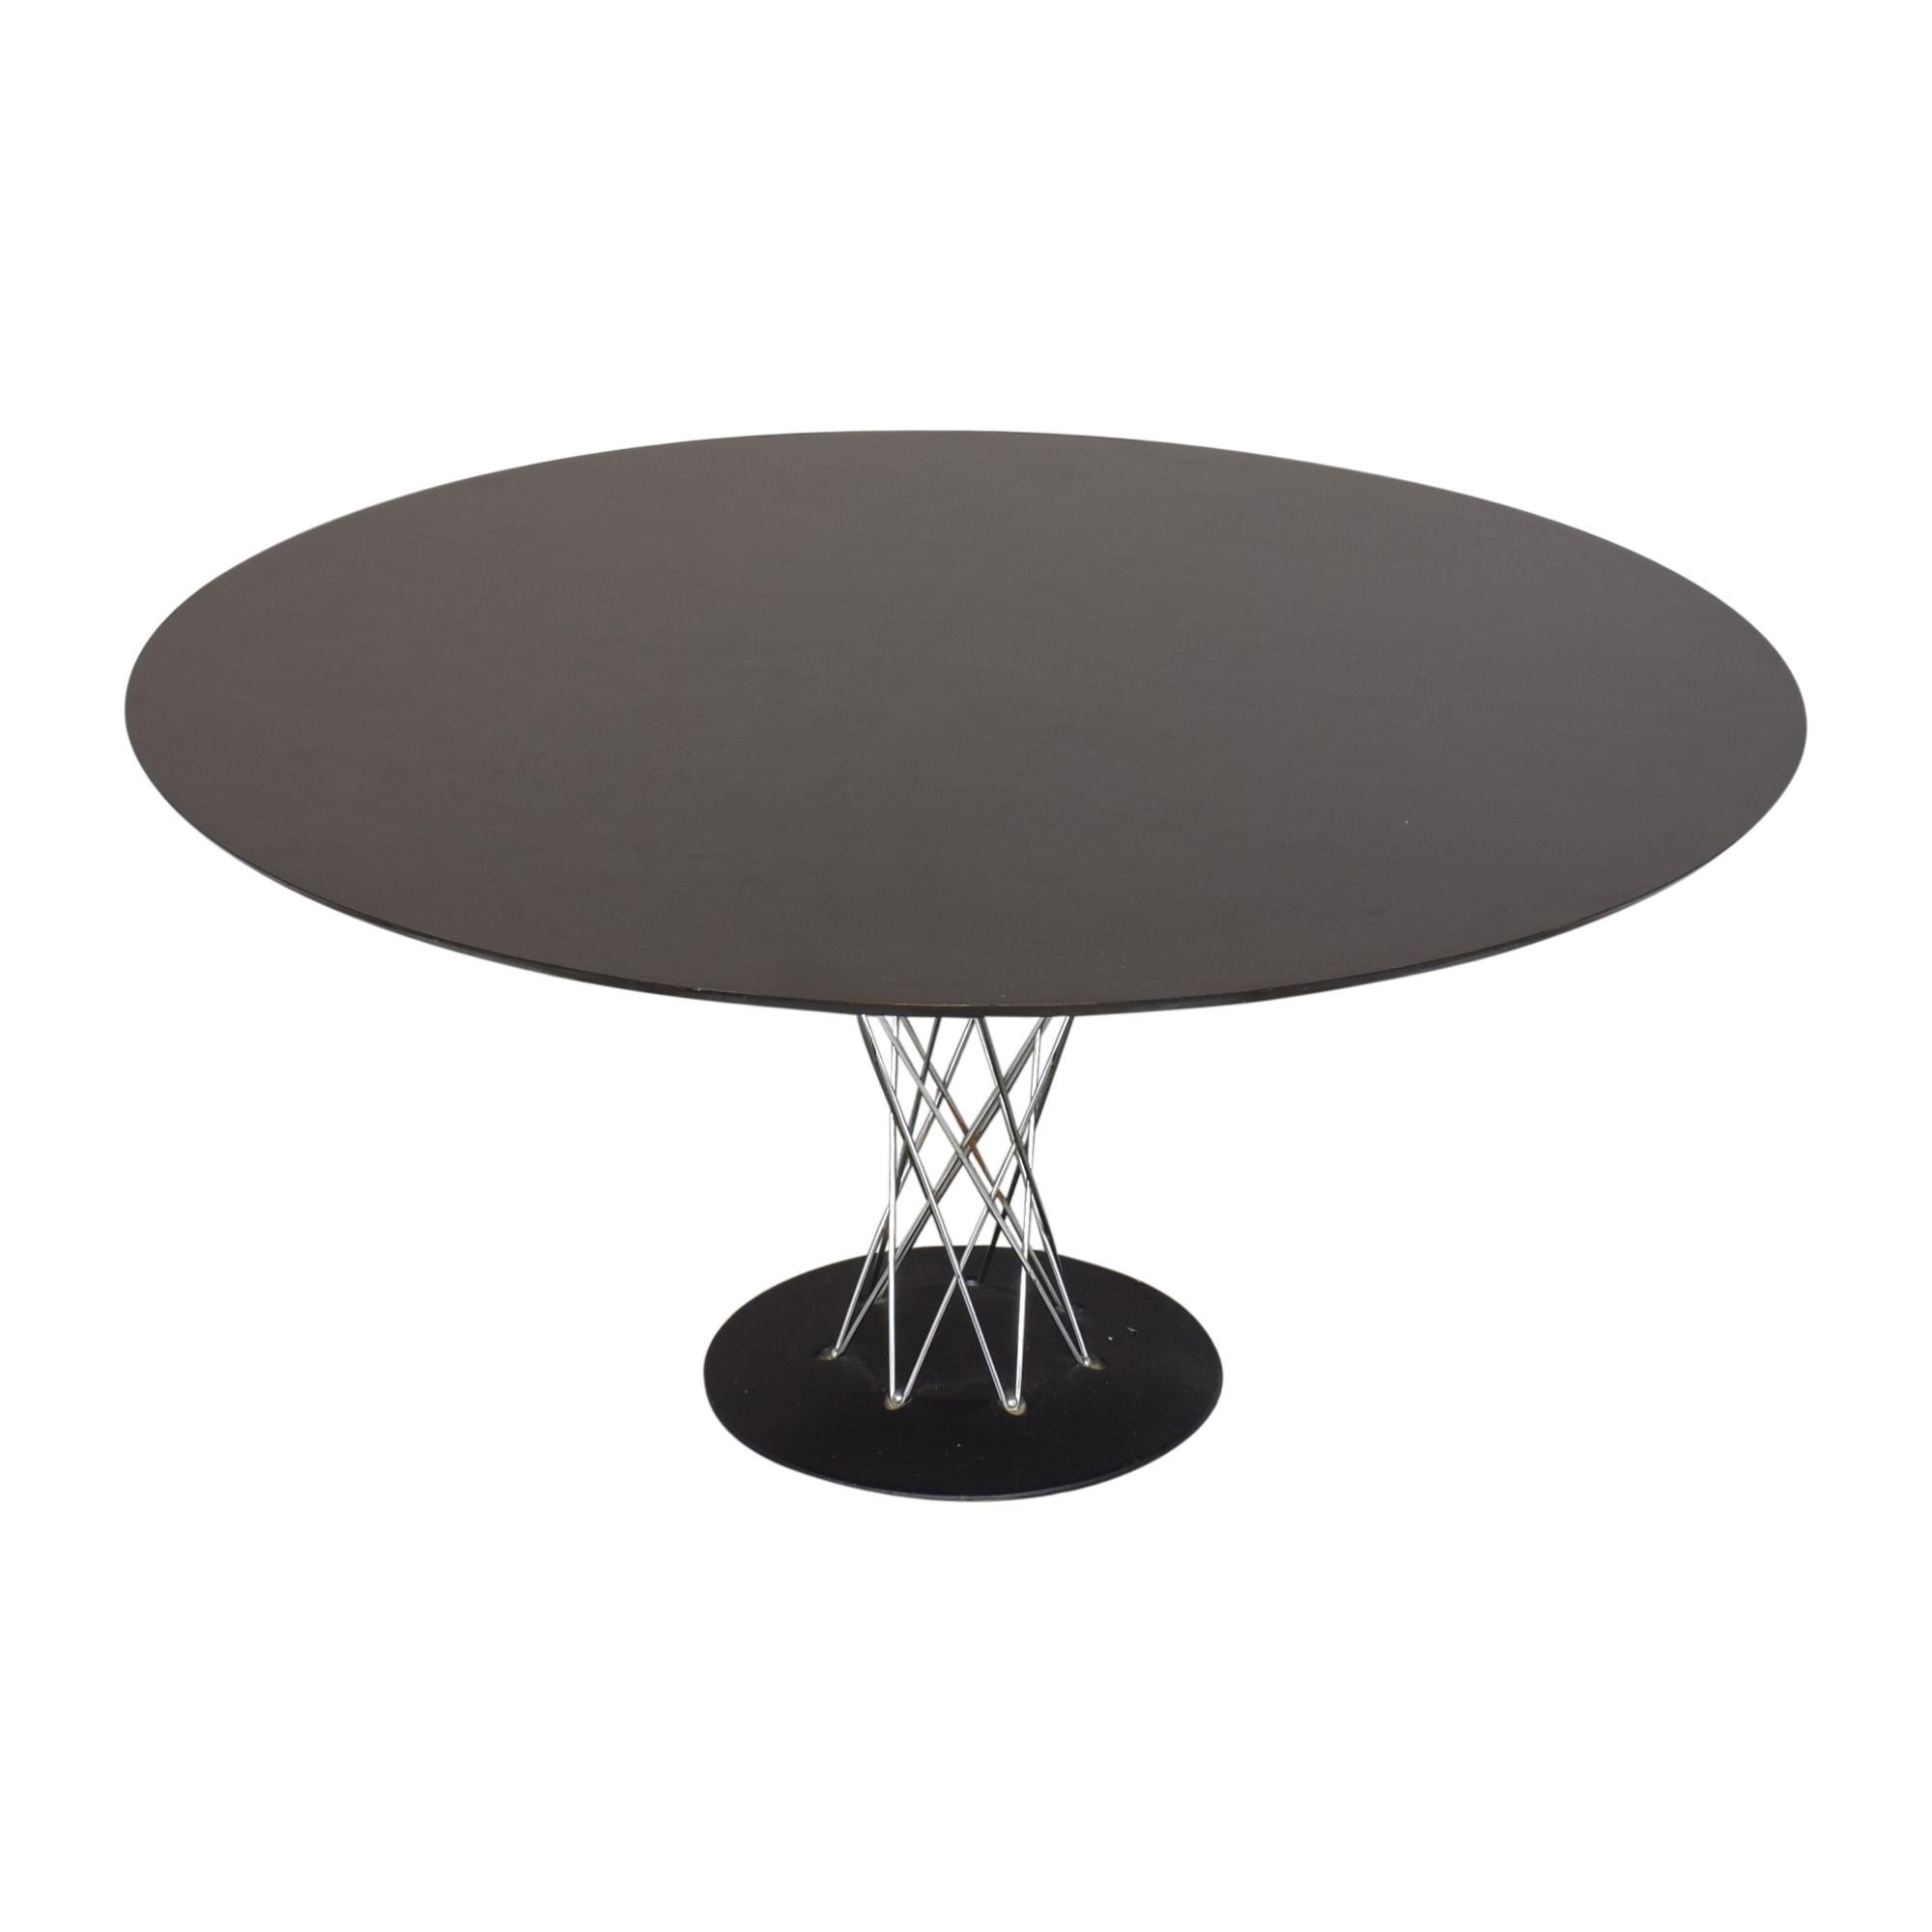 Modernica Modernica Cyclone Dining Table by Isamu Noguchi ma